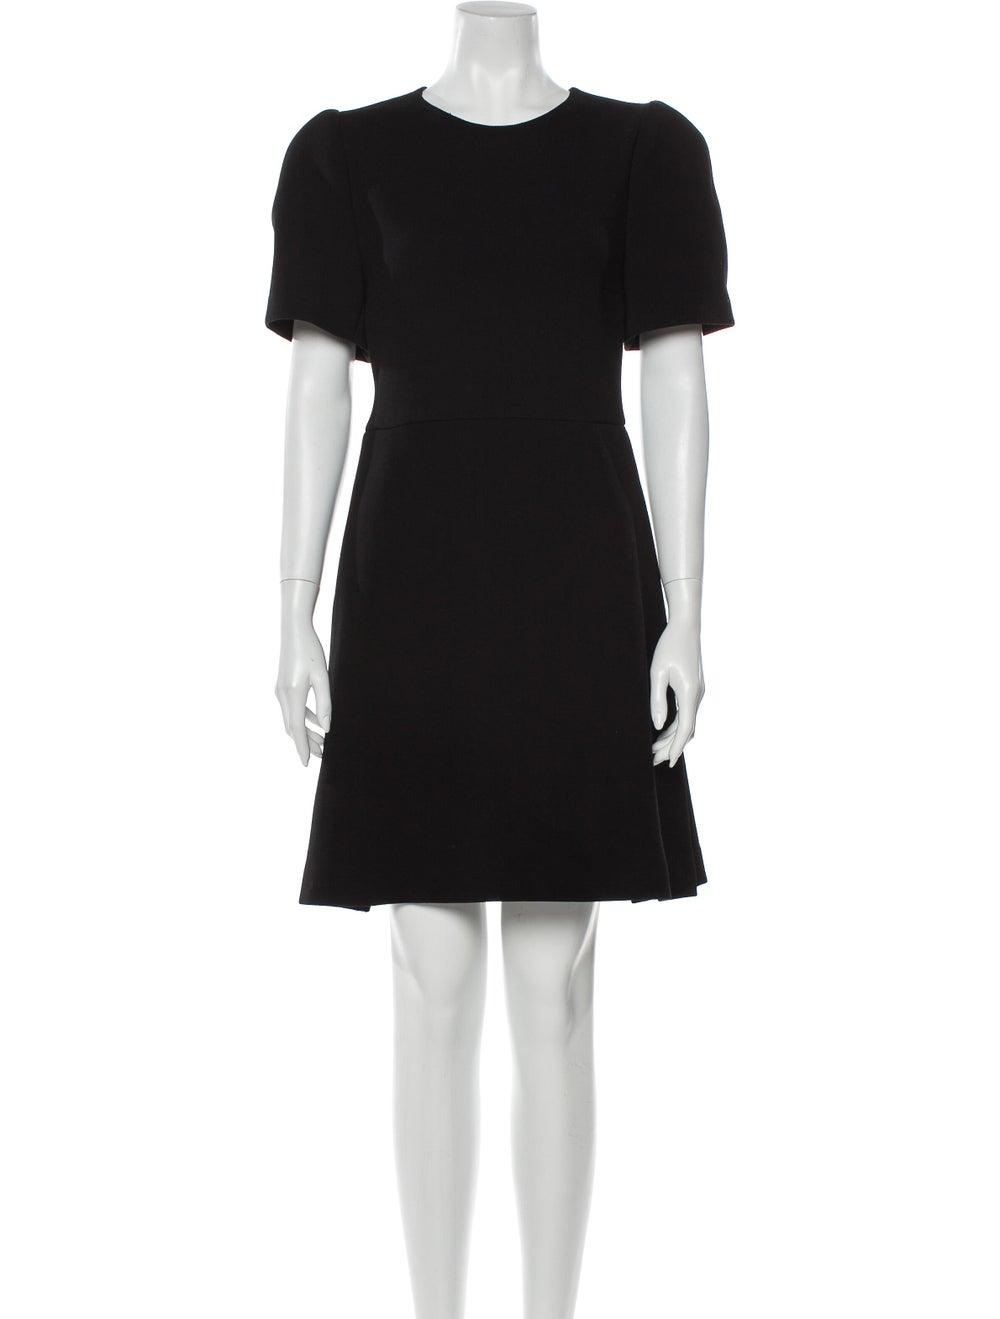 Prada Virgin Wool Mini Dress Wool - image 1